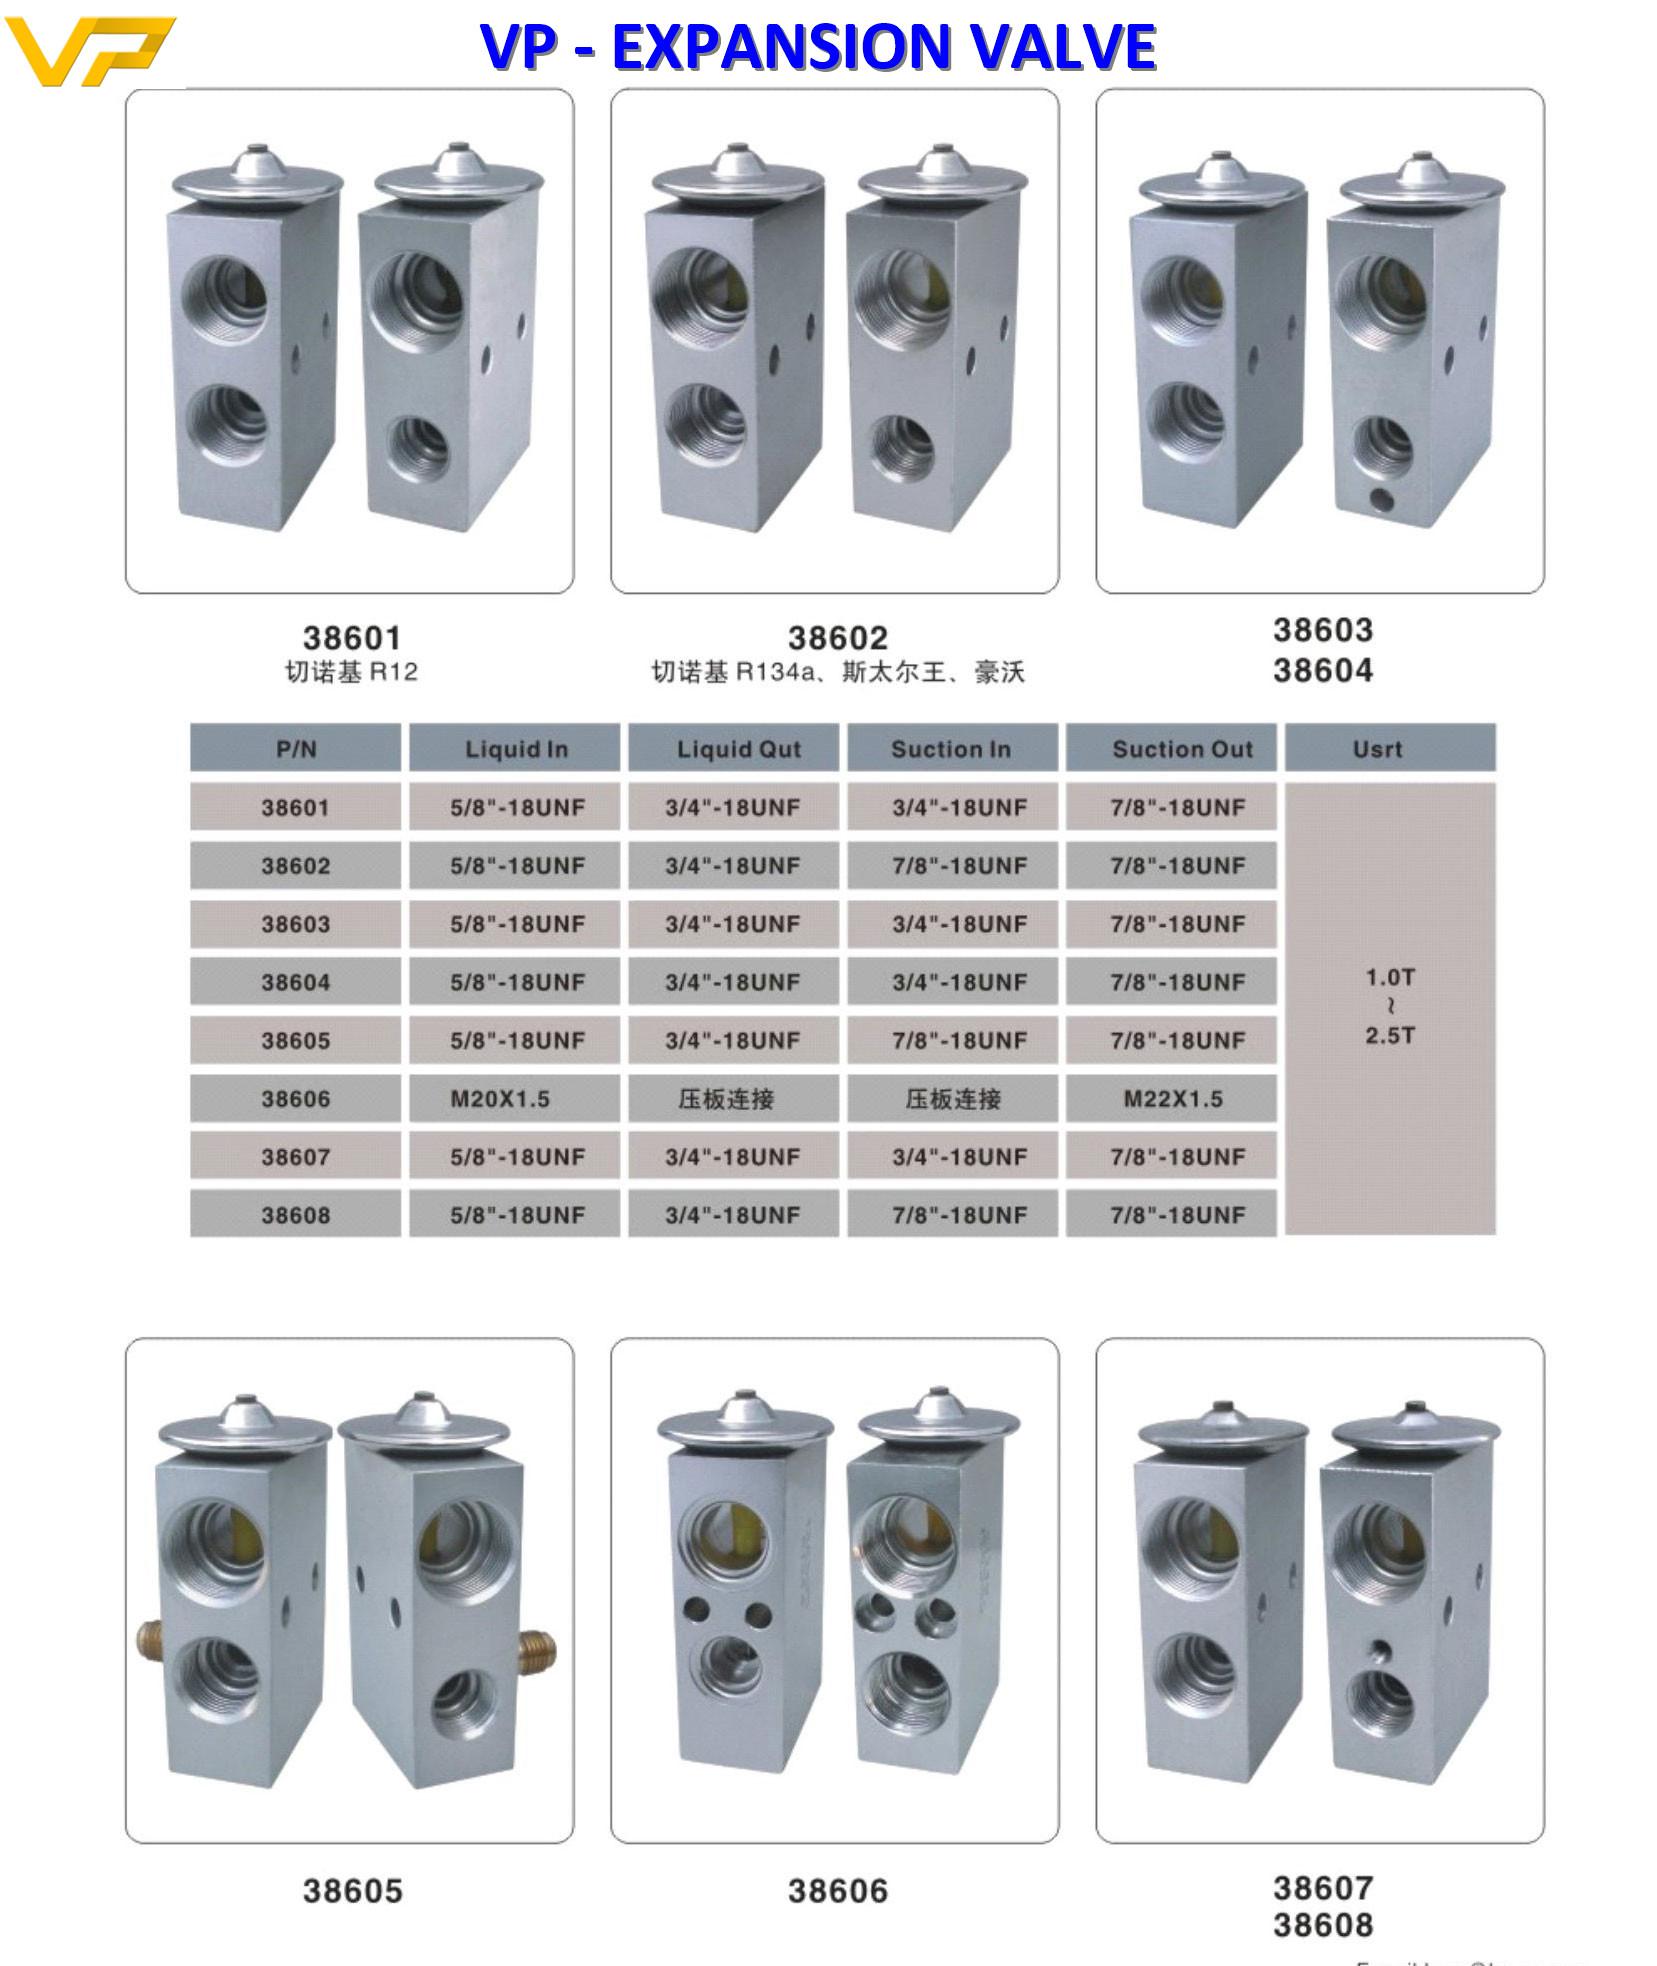 Car/bus/excavator expansion valves